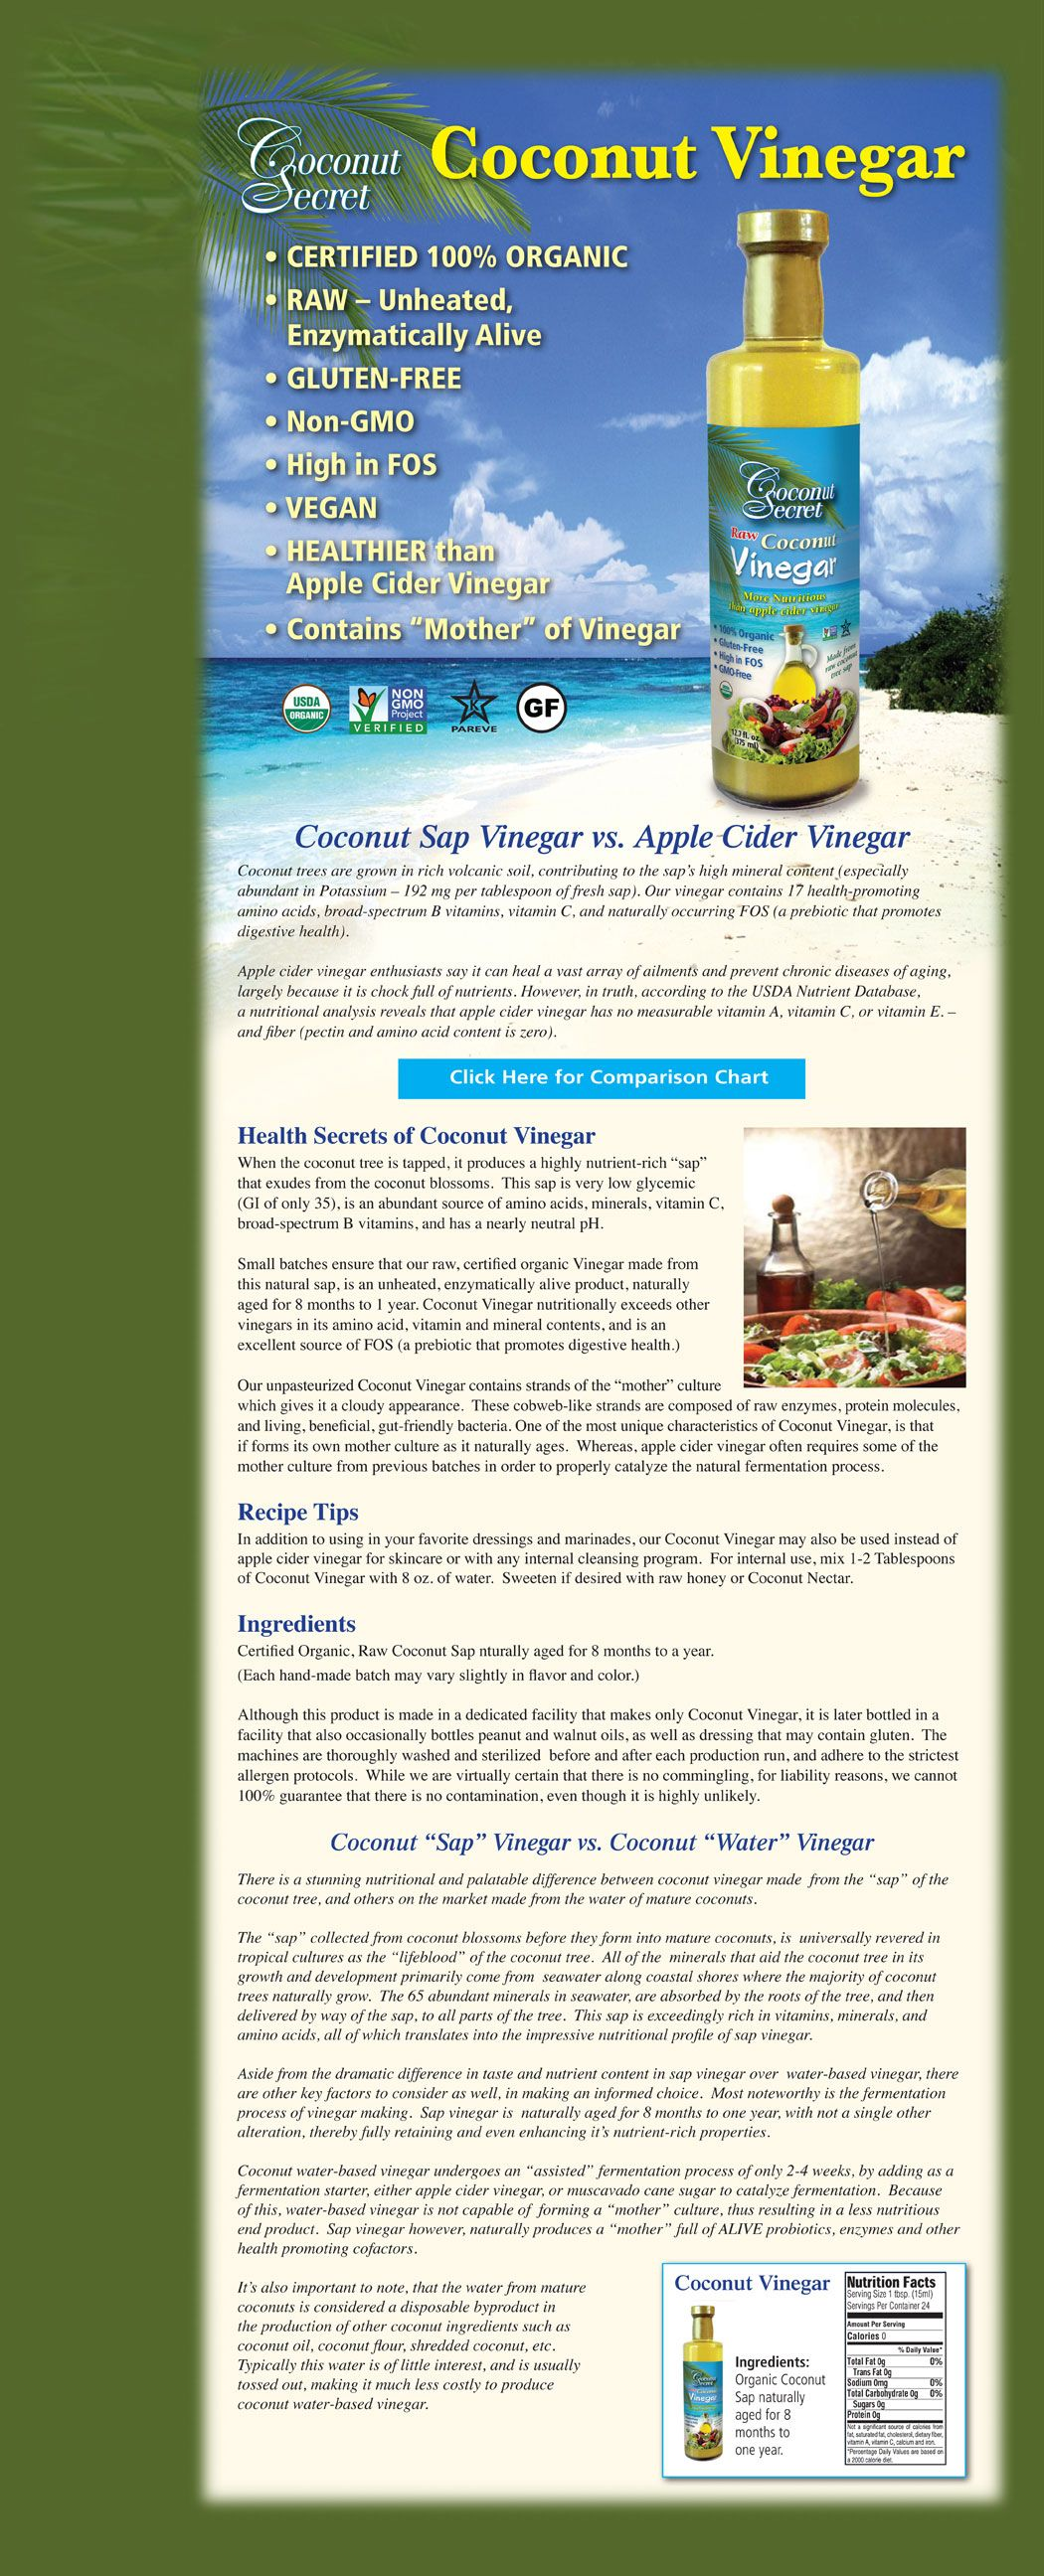 coconut vinegar | coconut health benefits, hypothyroidism